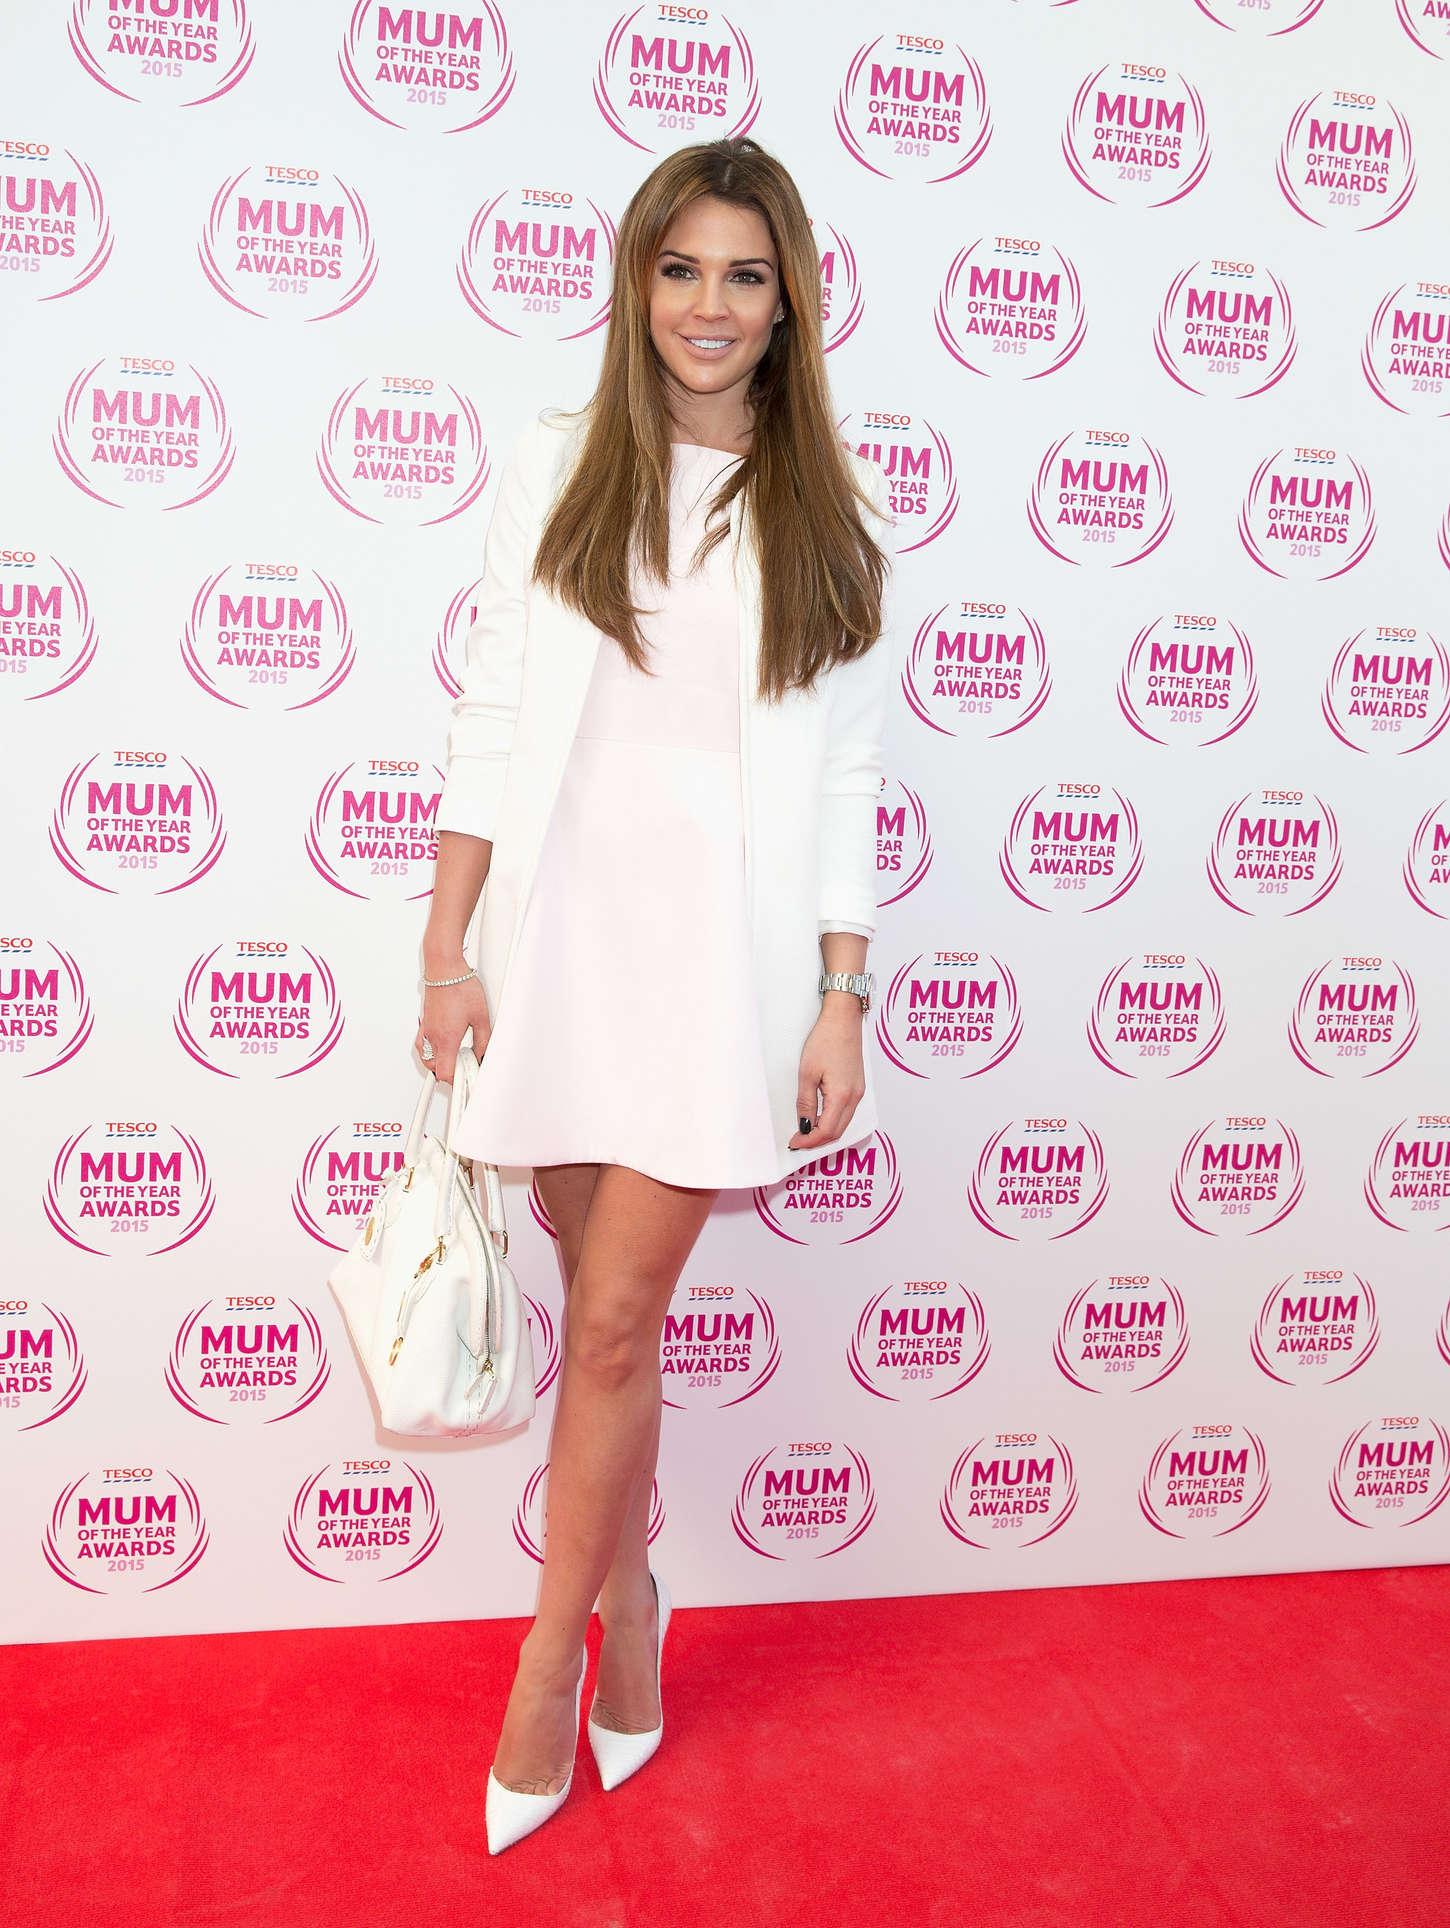 Danielle Lloyd Tesco Mum Of The Year Awards in London